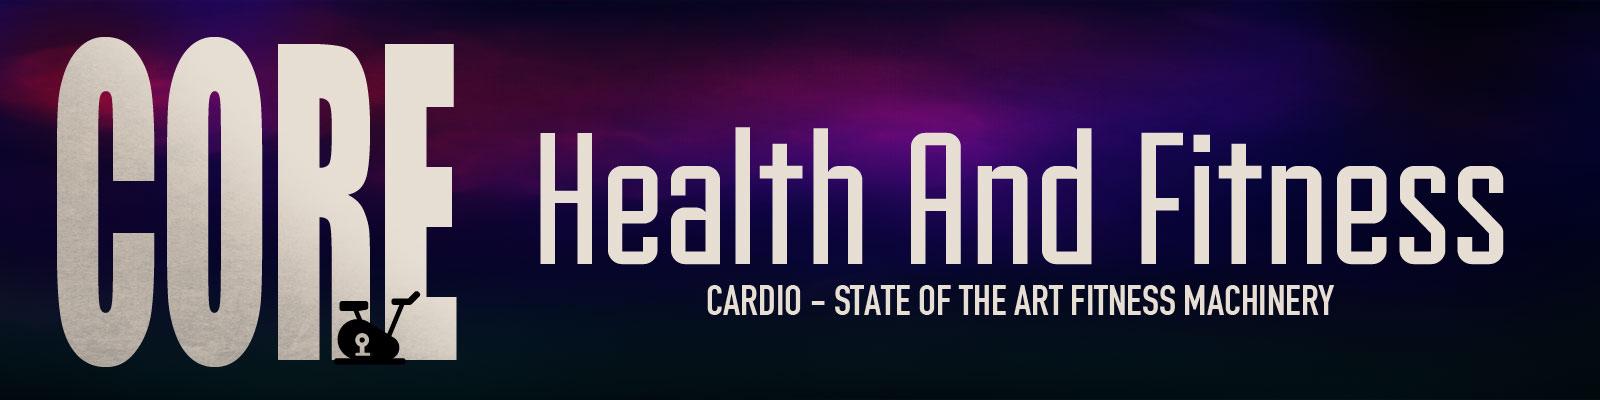 Durrow Gym - Core Health & Fitness Cardio